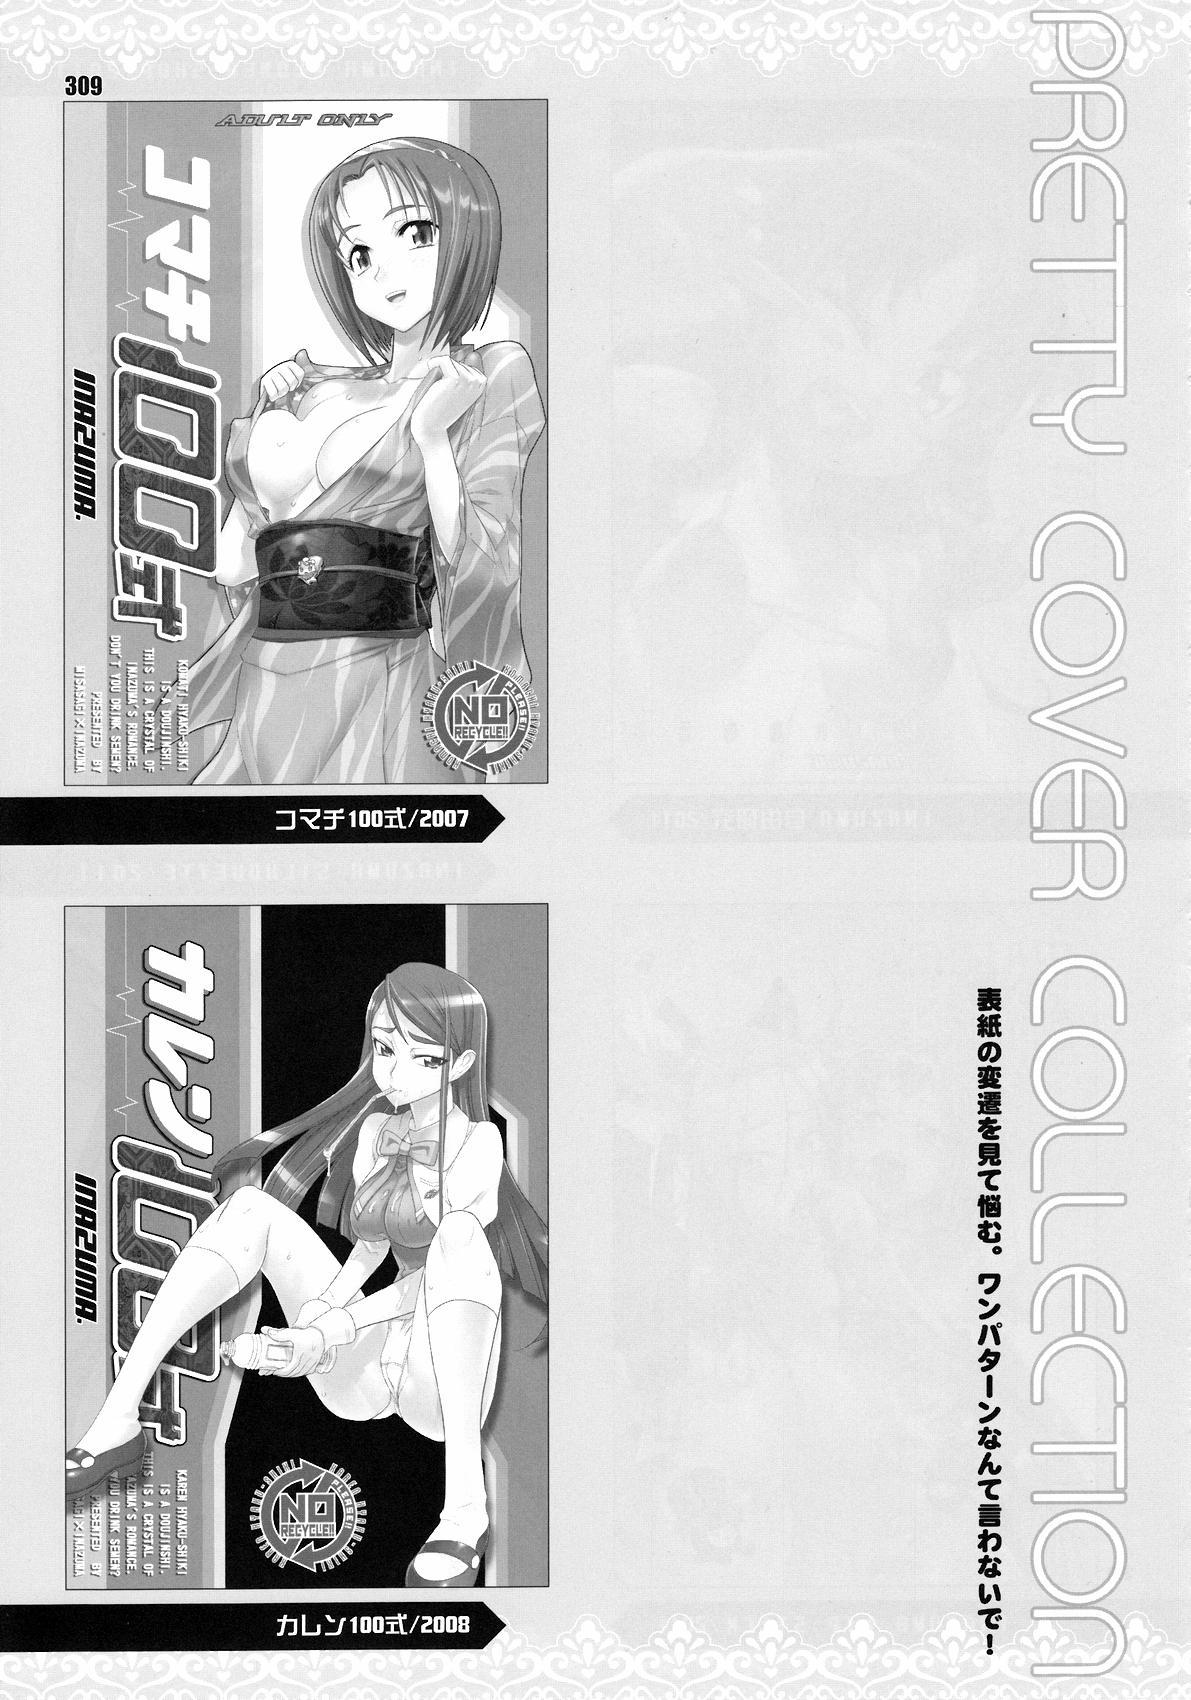 Inazuma Pretty Warrior 306